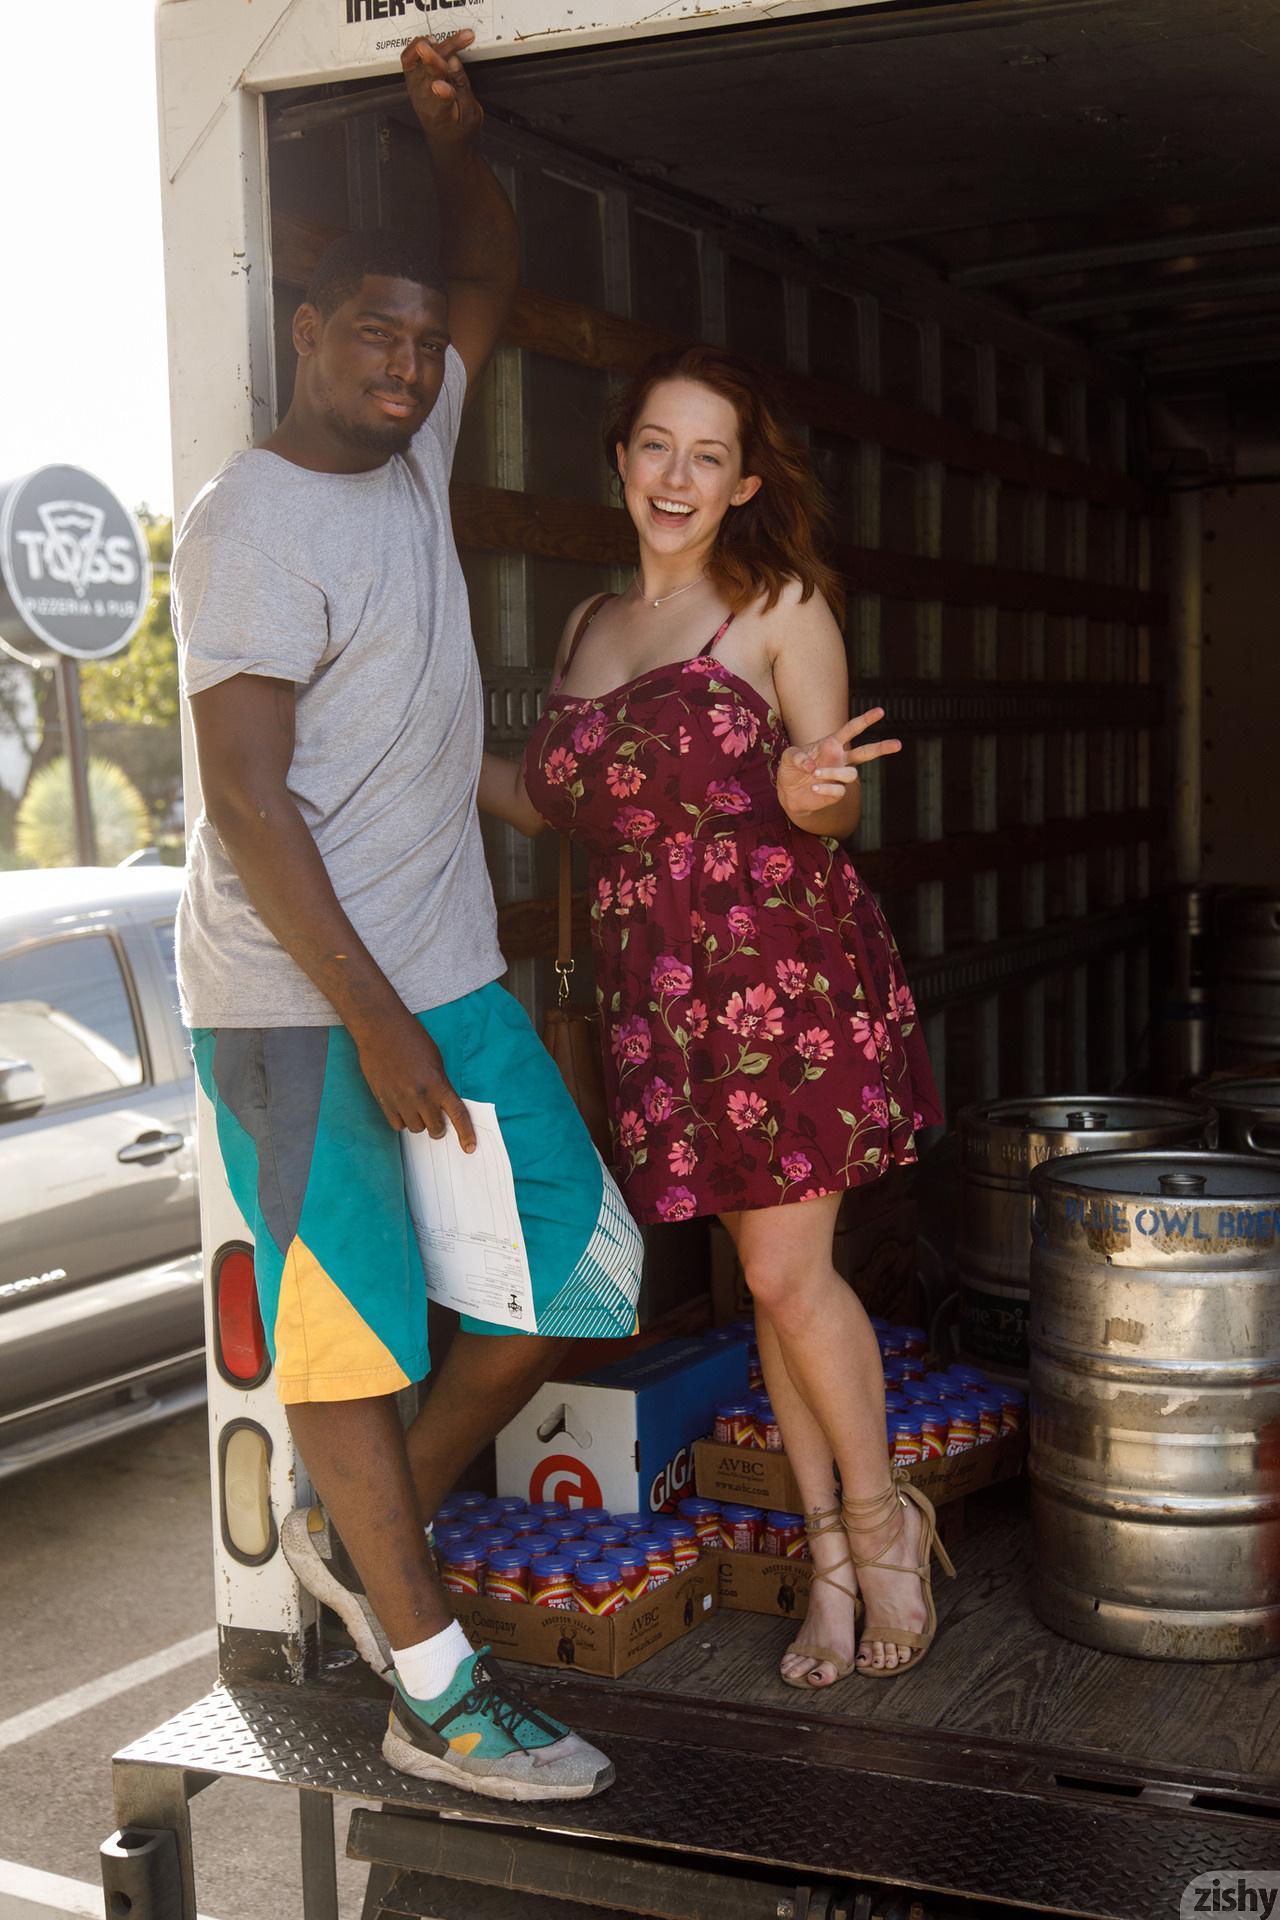 Kelsey Berneray And Gigantic Brewing Zishy (58)